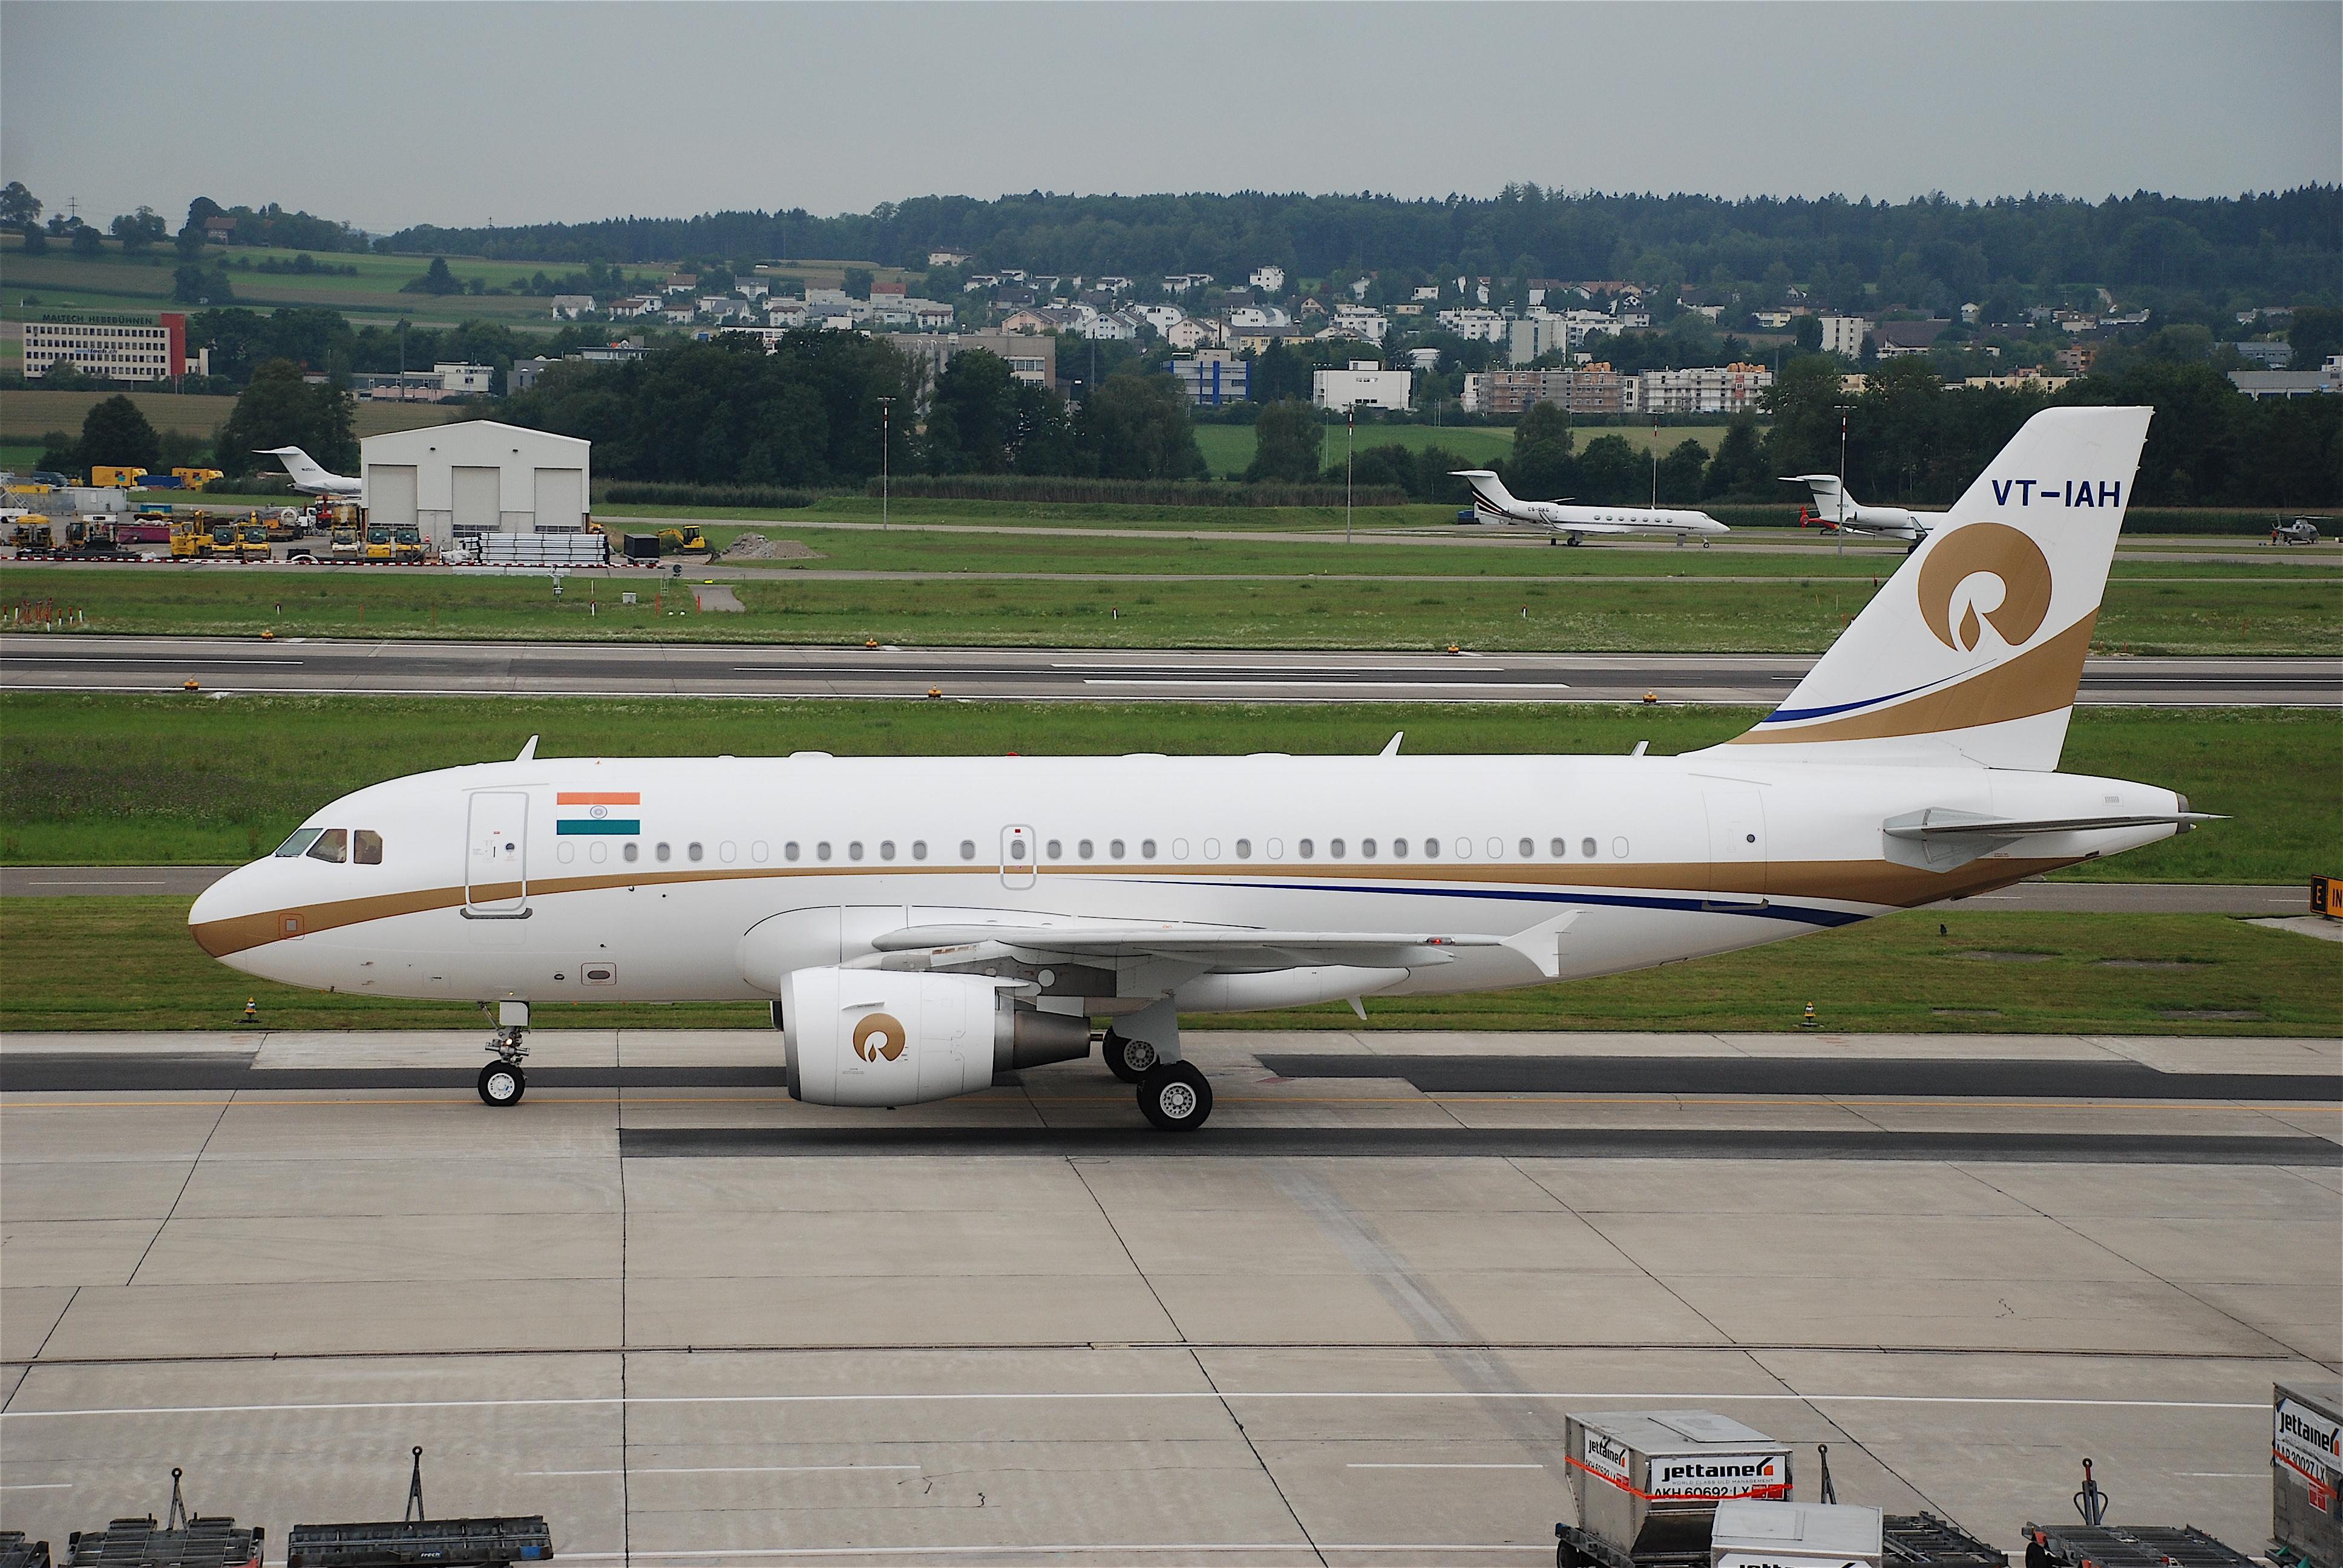 File:VT-IAH@ZRH,22.08.2008-527eu - Flickr - Aero Icarus ...